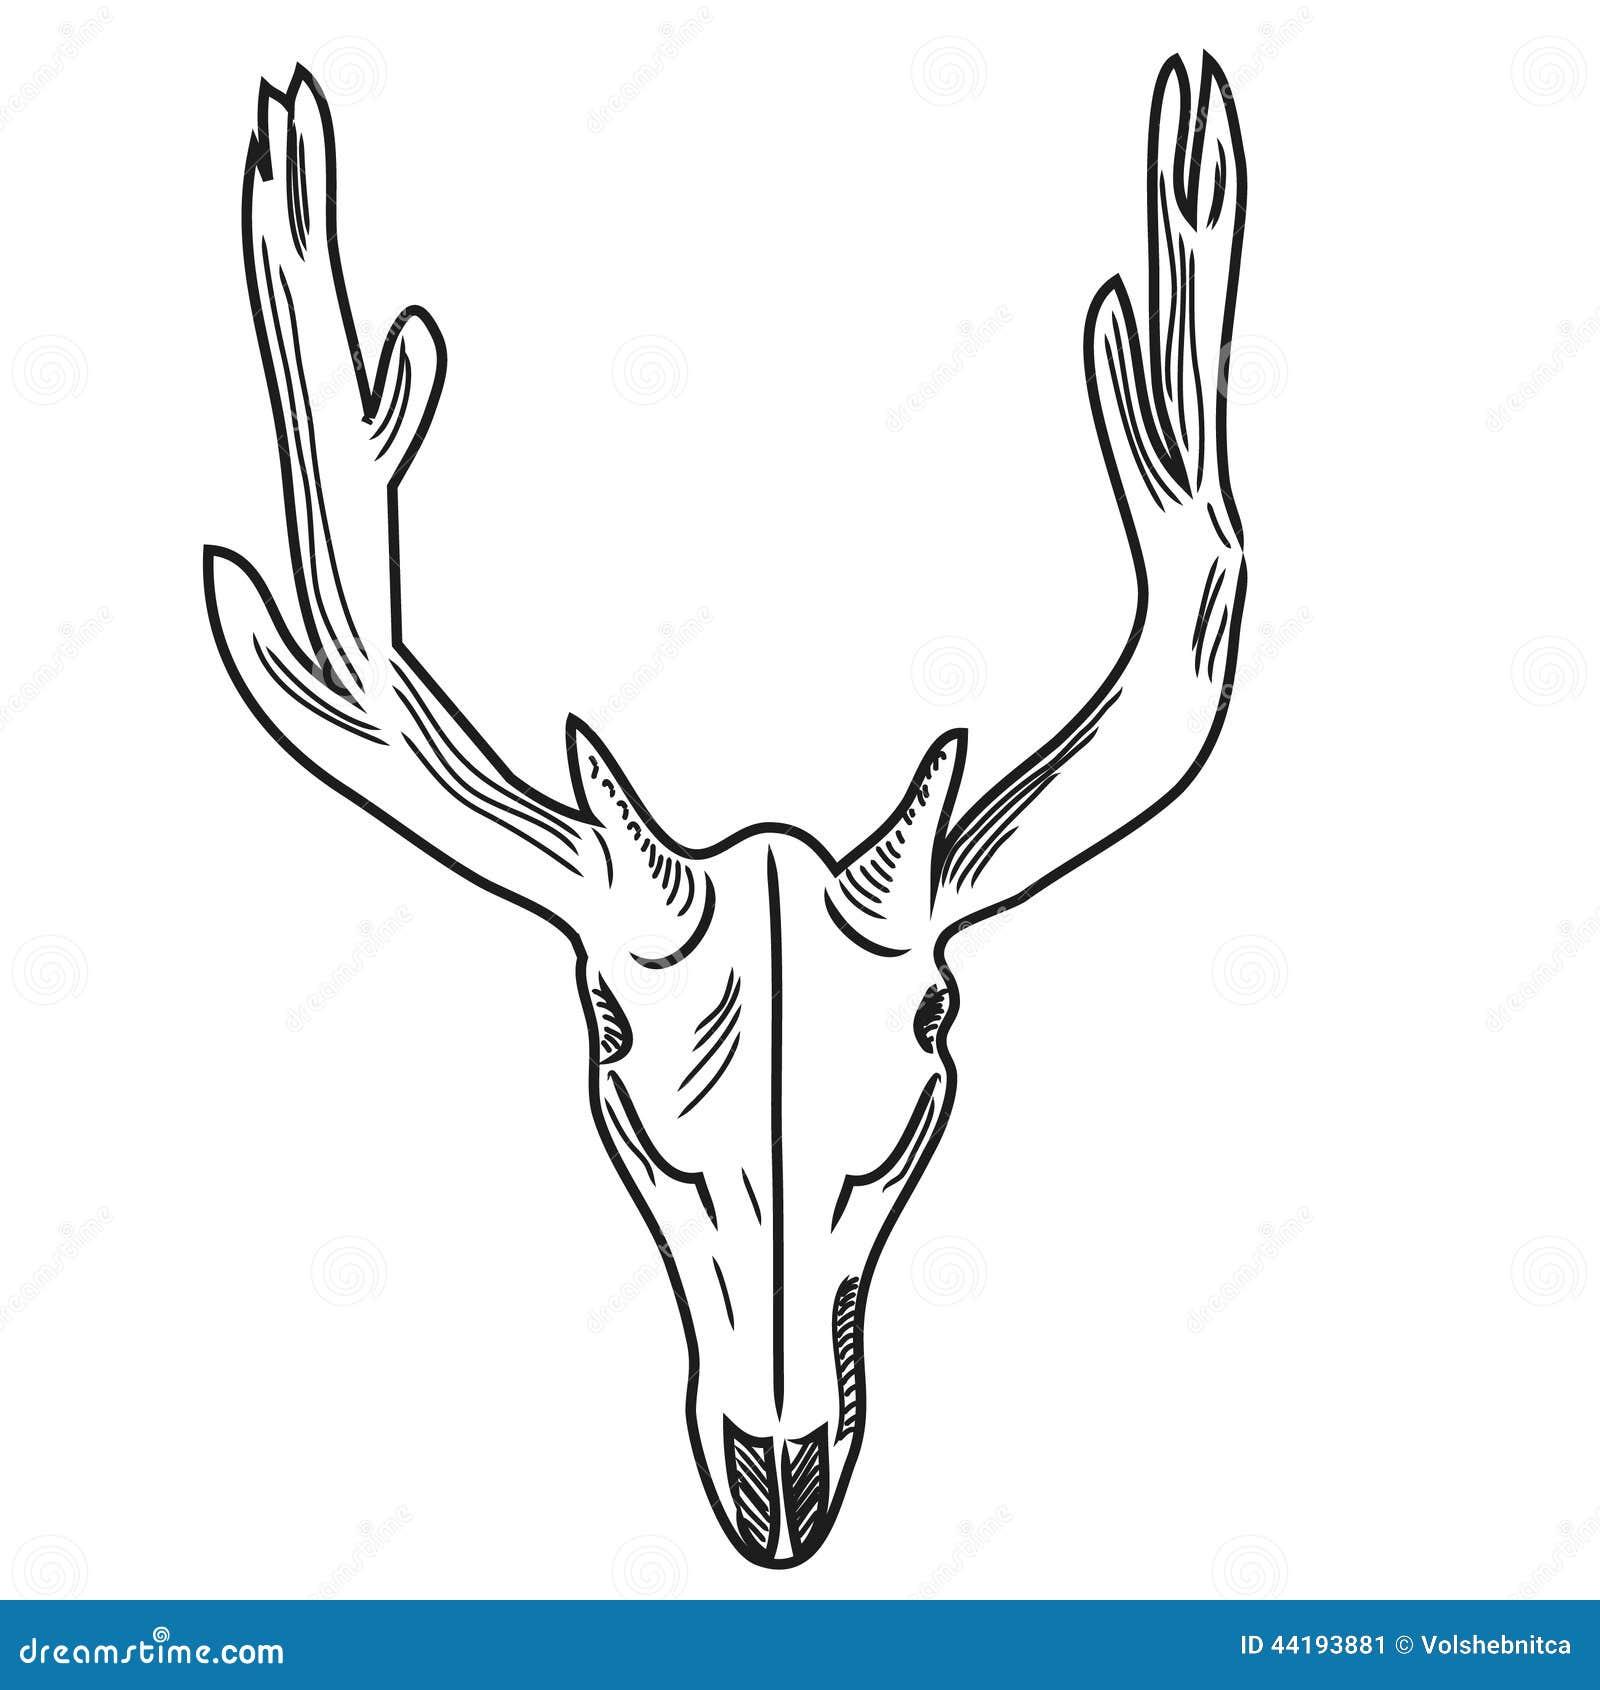 Skull of a deer